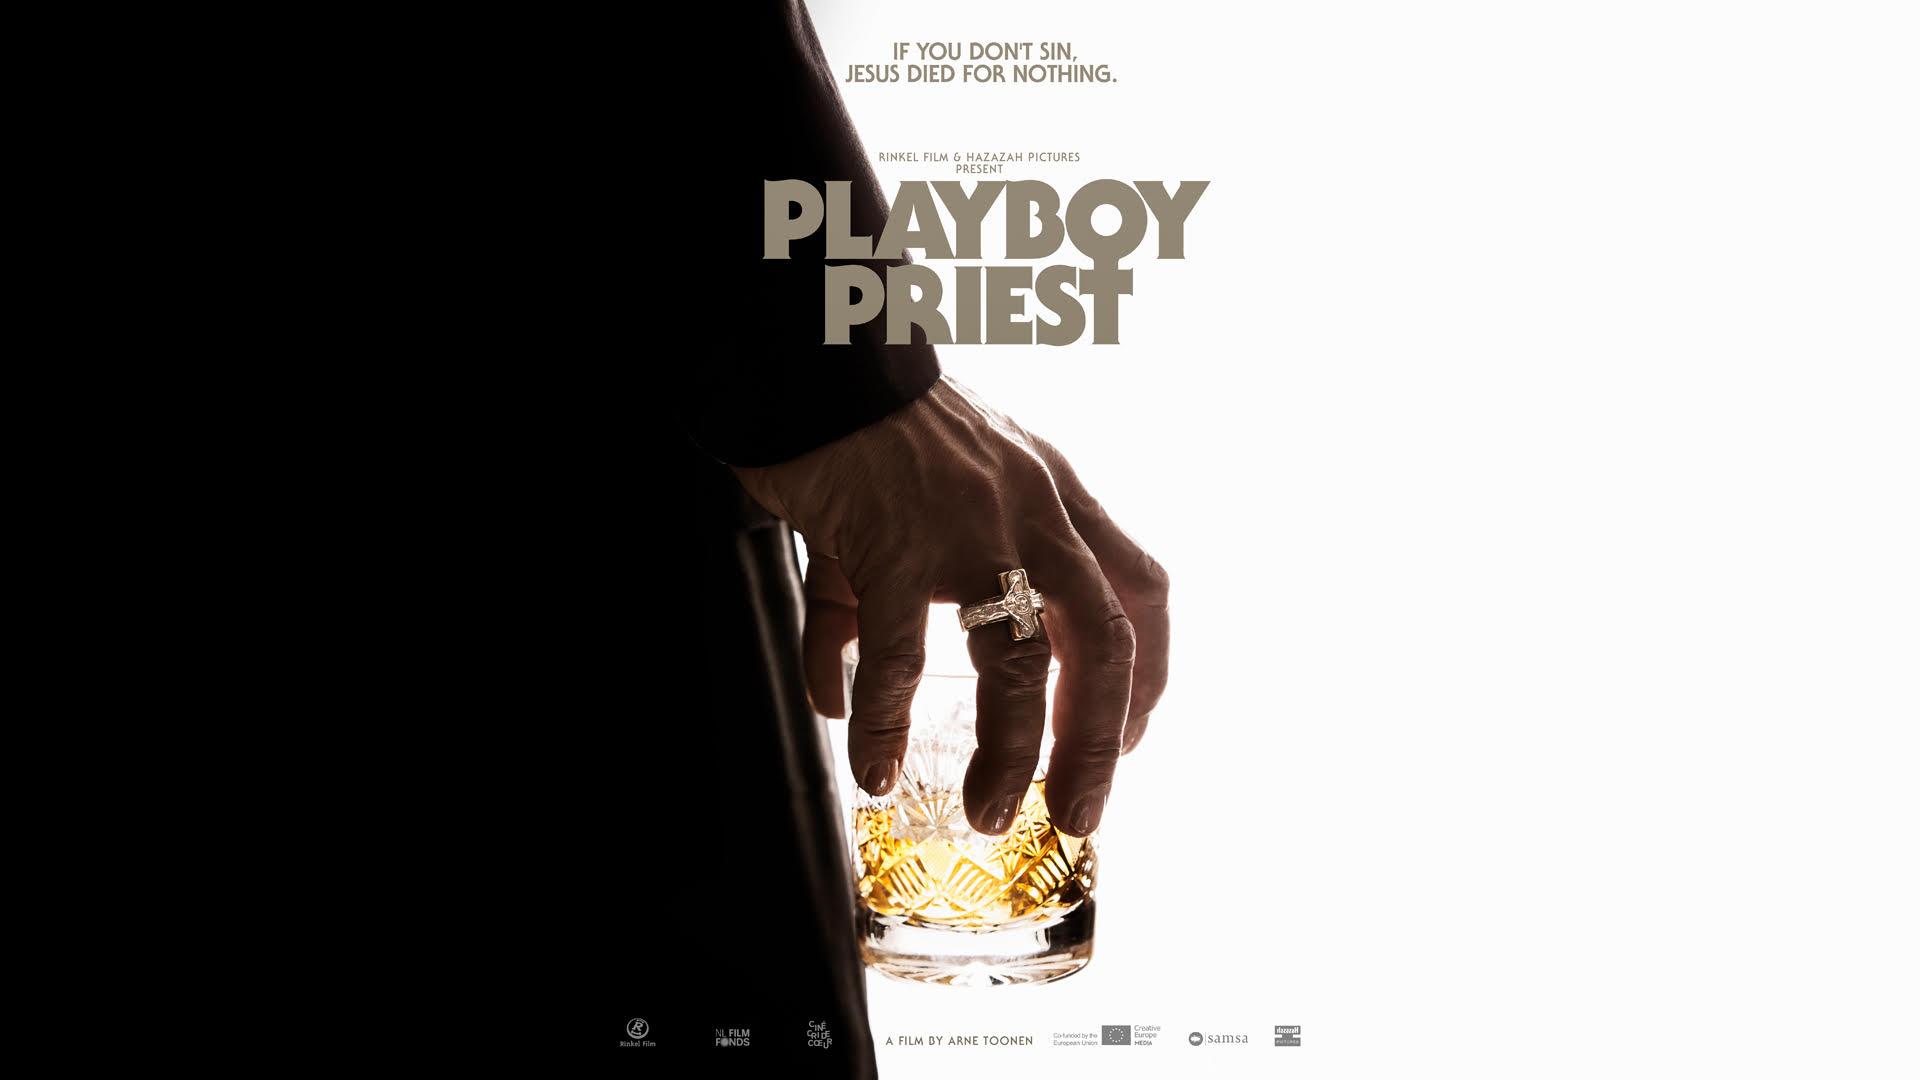 Playboy Priest